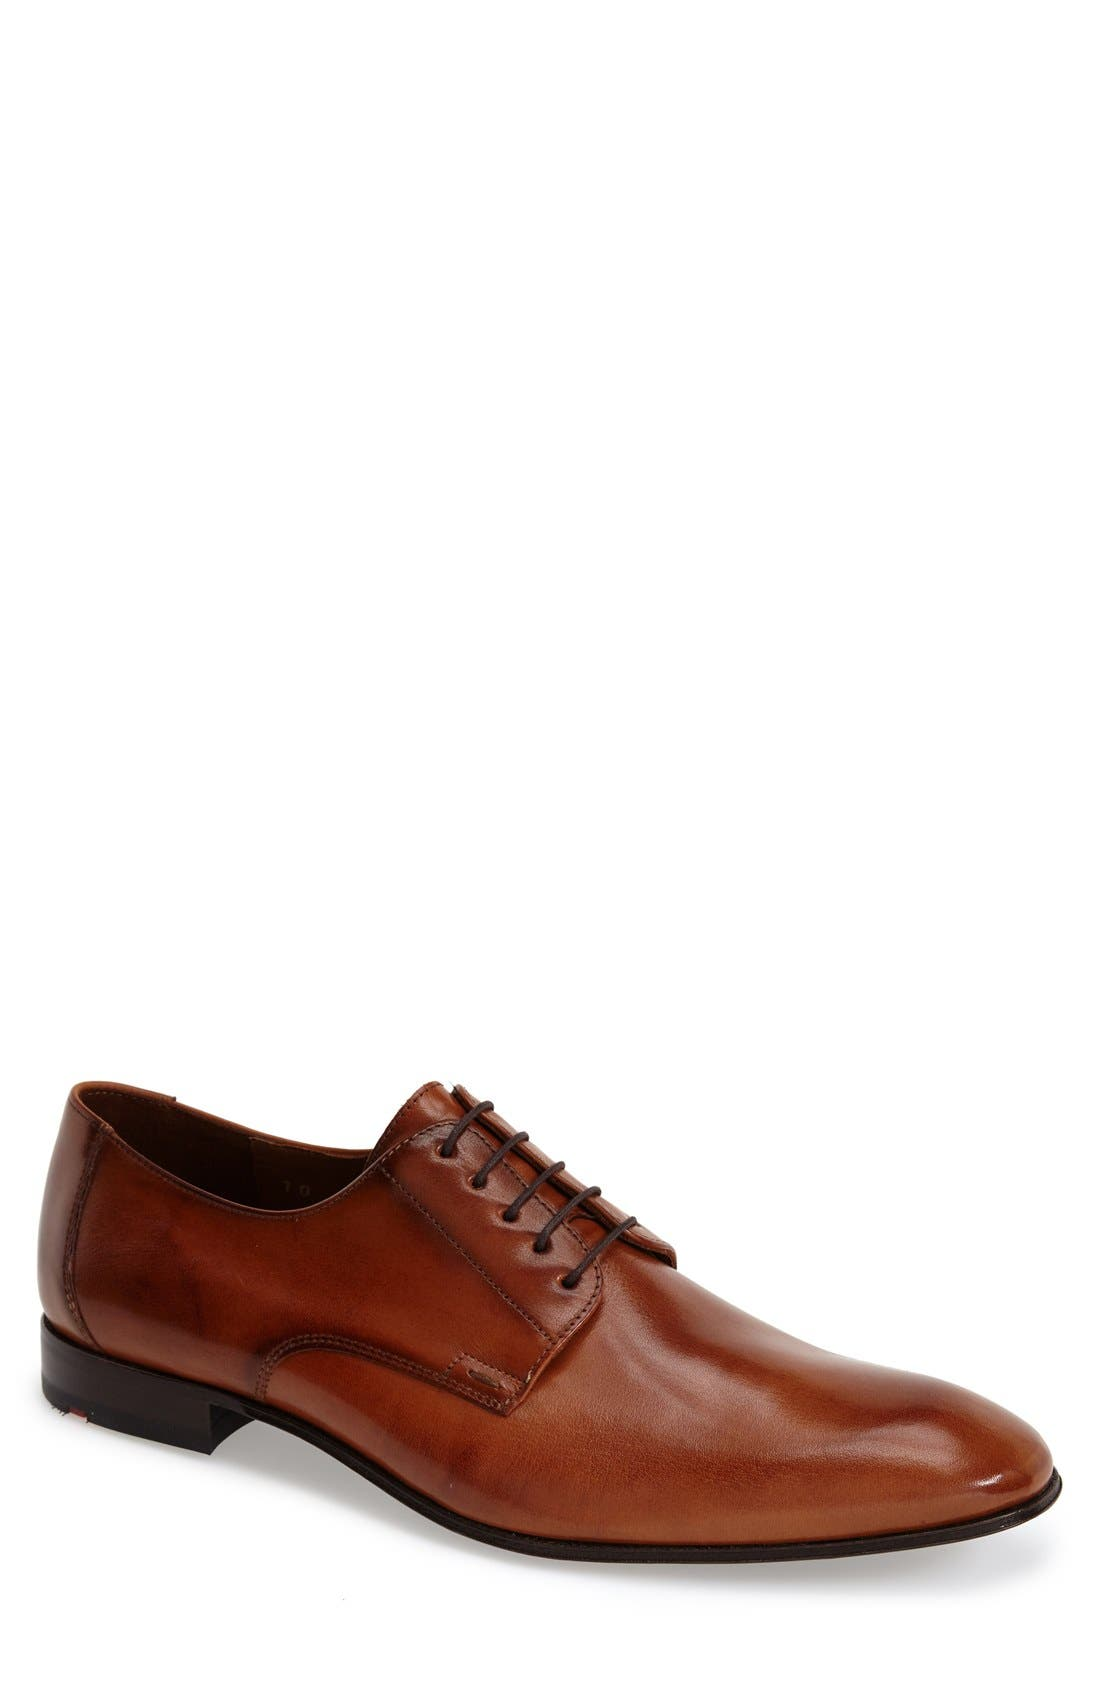 'Laurin' Plain Toe Derby,                         Main,                         color, Light Brown